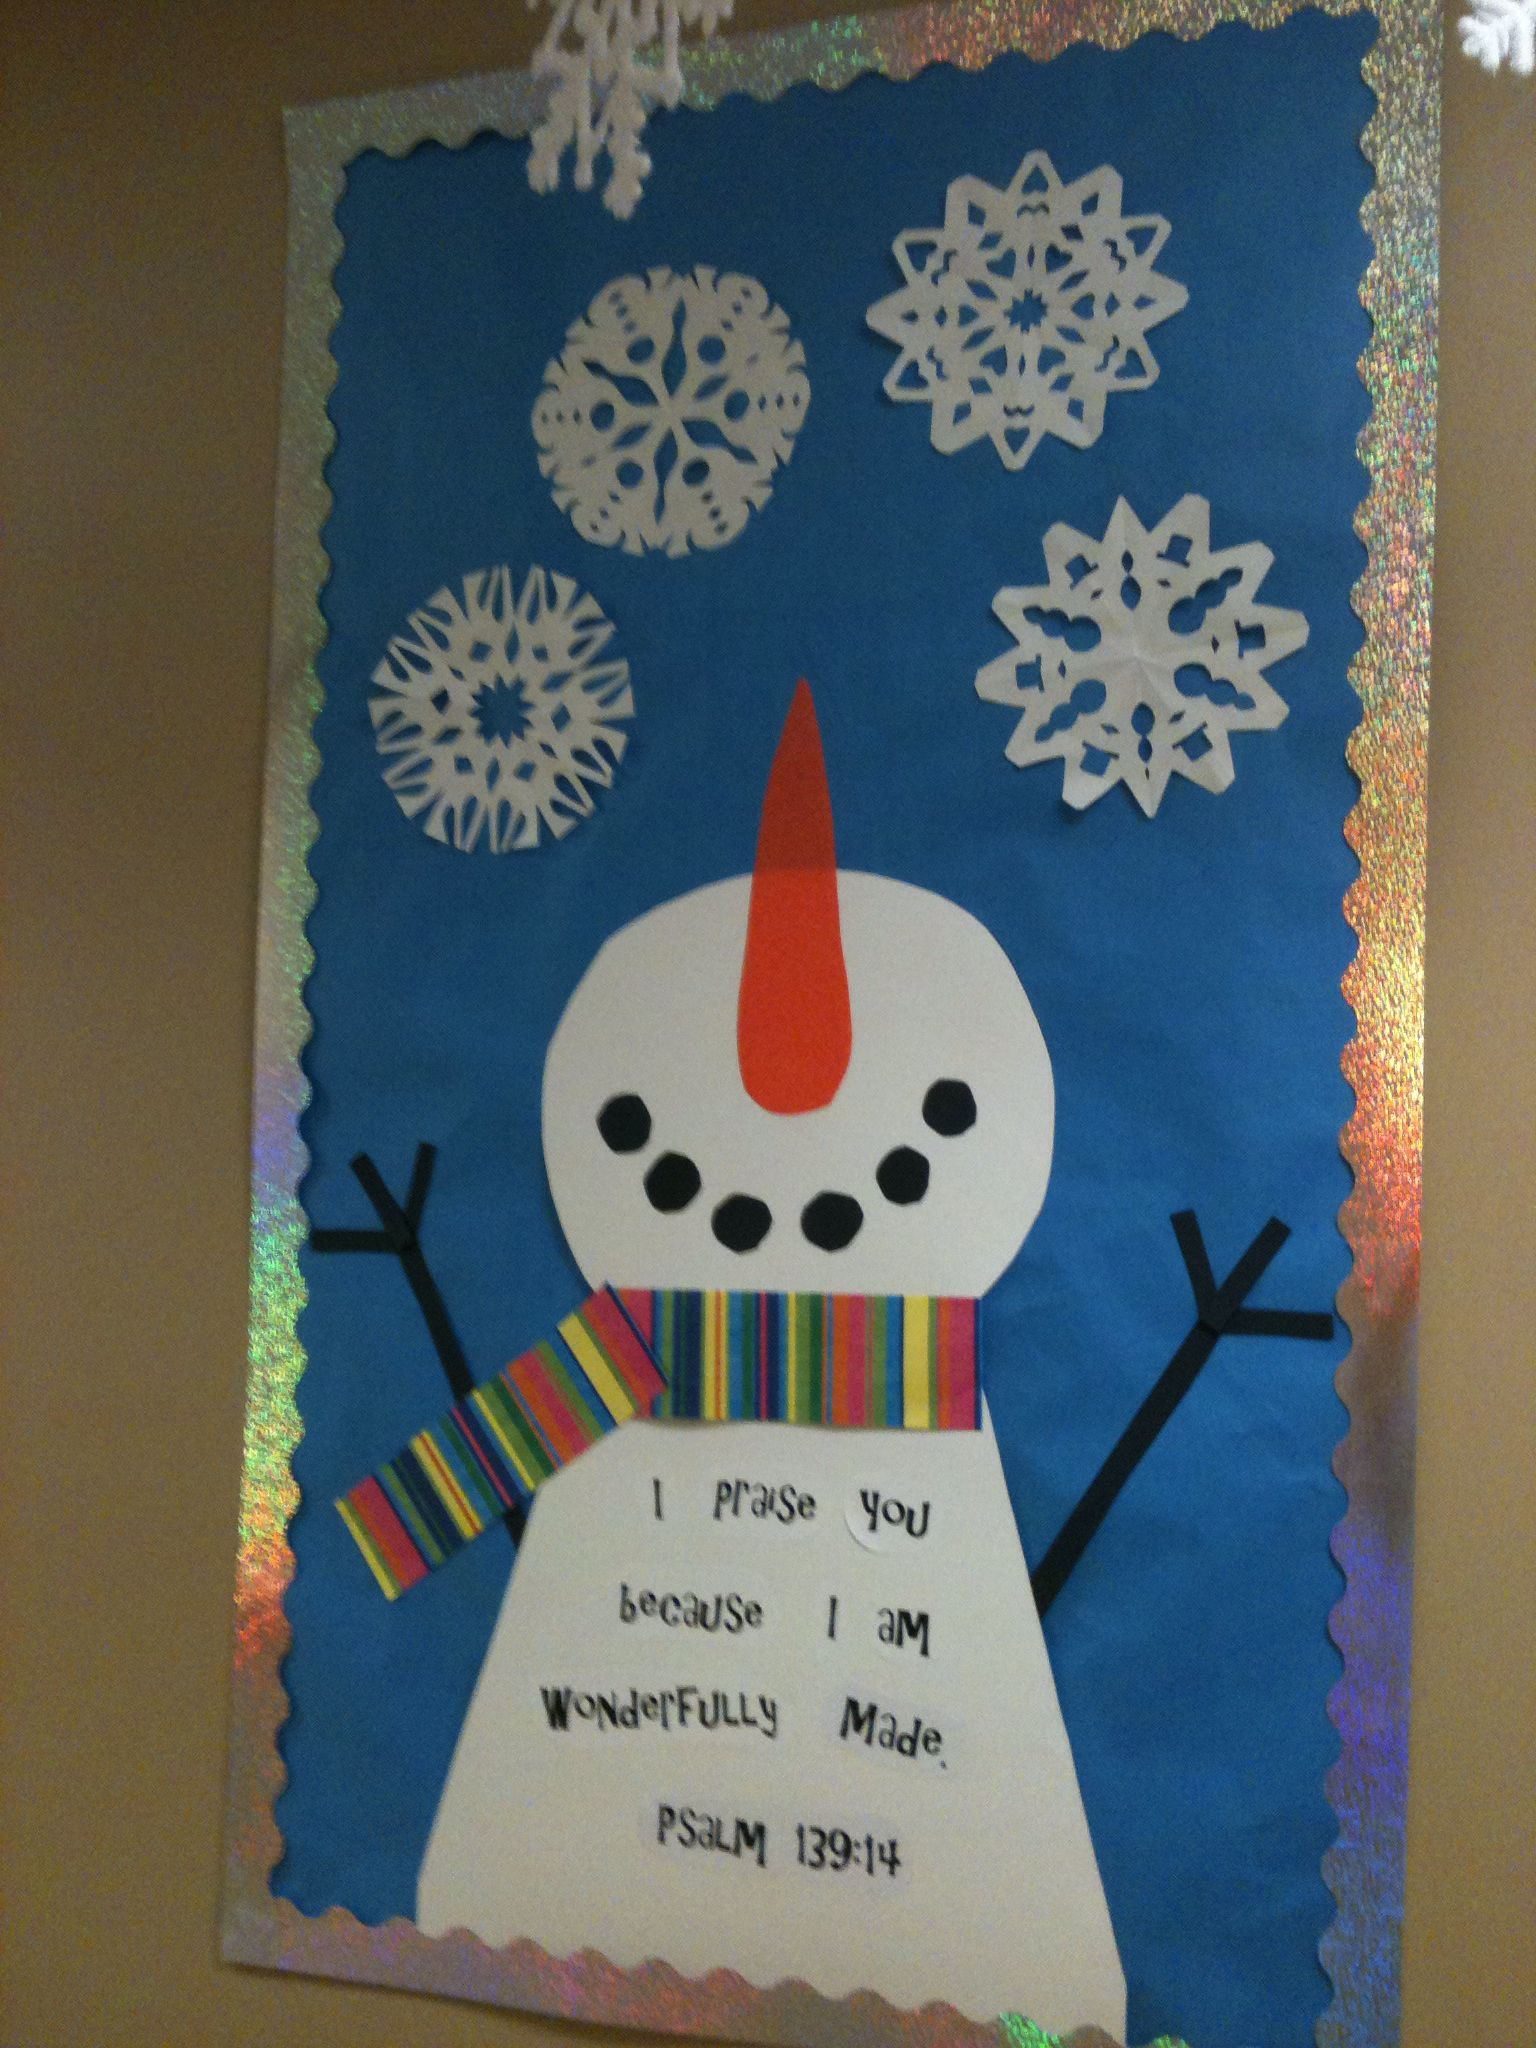 fascinating Sunday School Christmas Bulletin Board Ideas Part - 1: Sunday school winter bulletin board